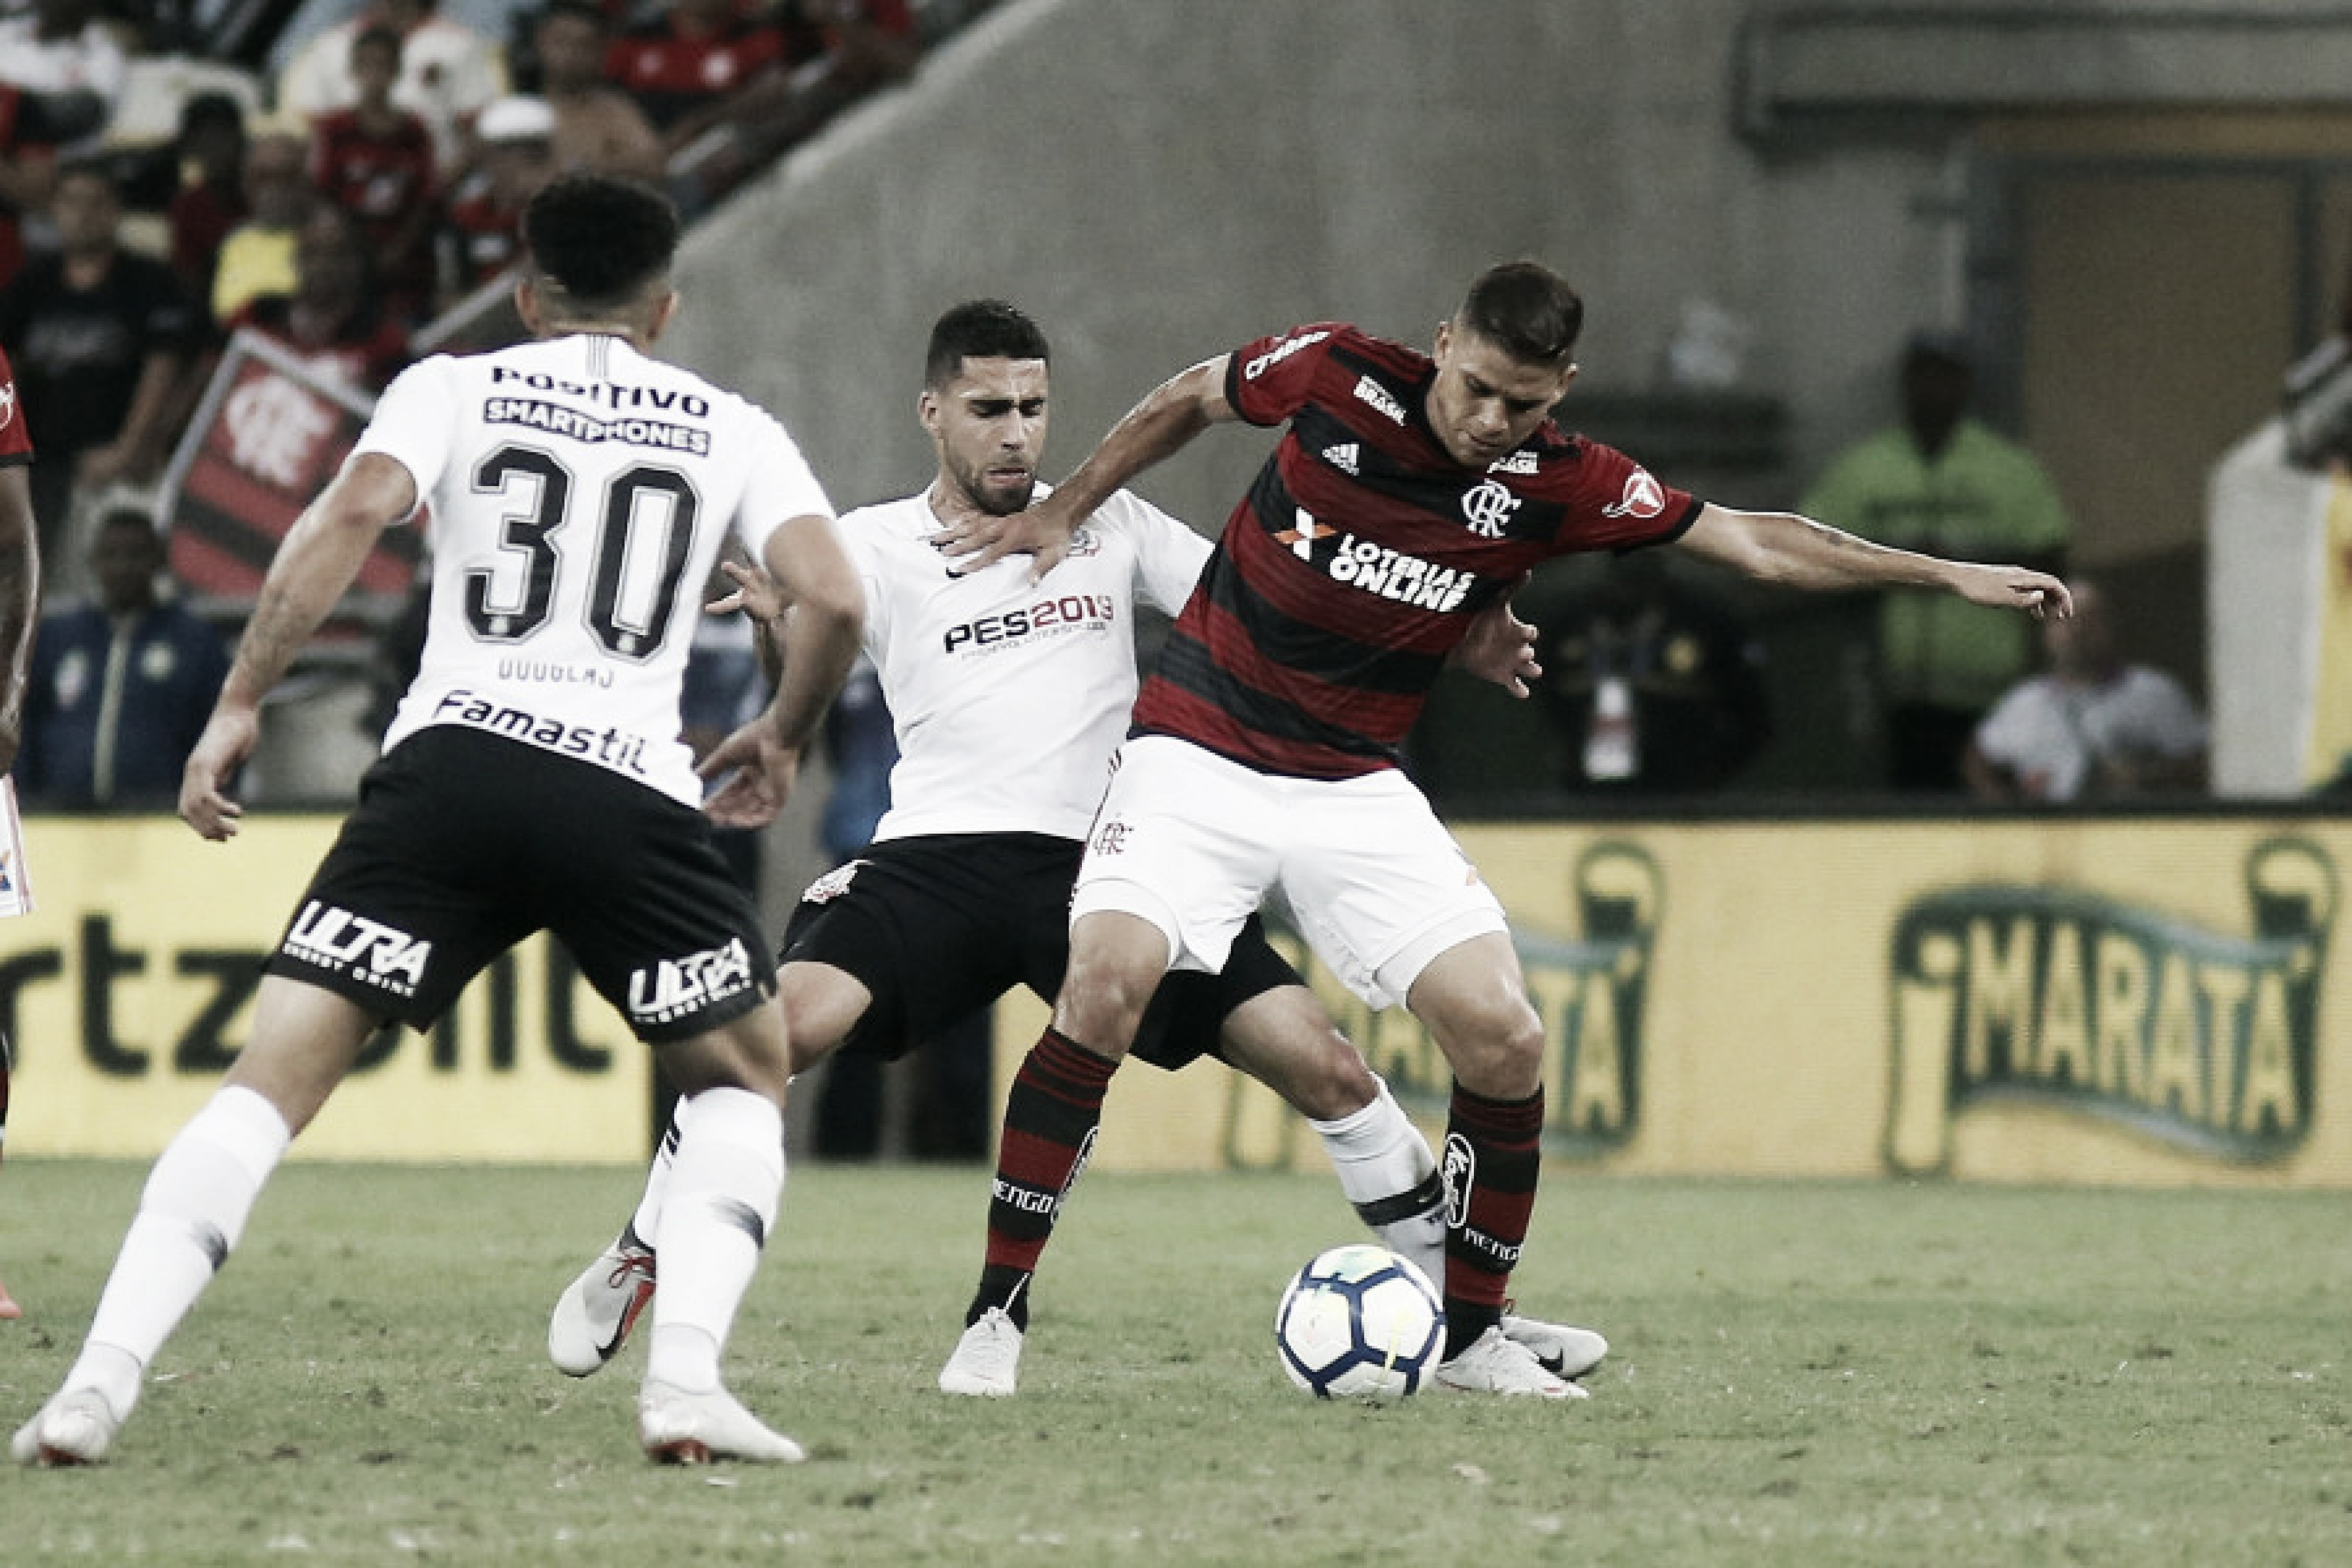 Flamengo pressiona, mas Corinthians segura empate sem gols no Maracanã